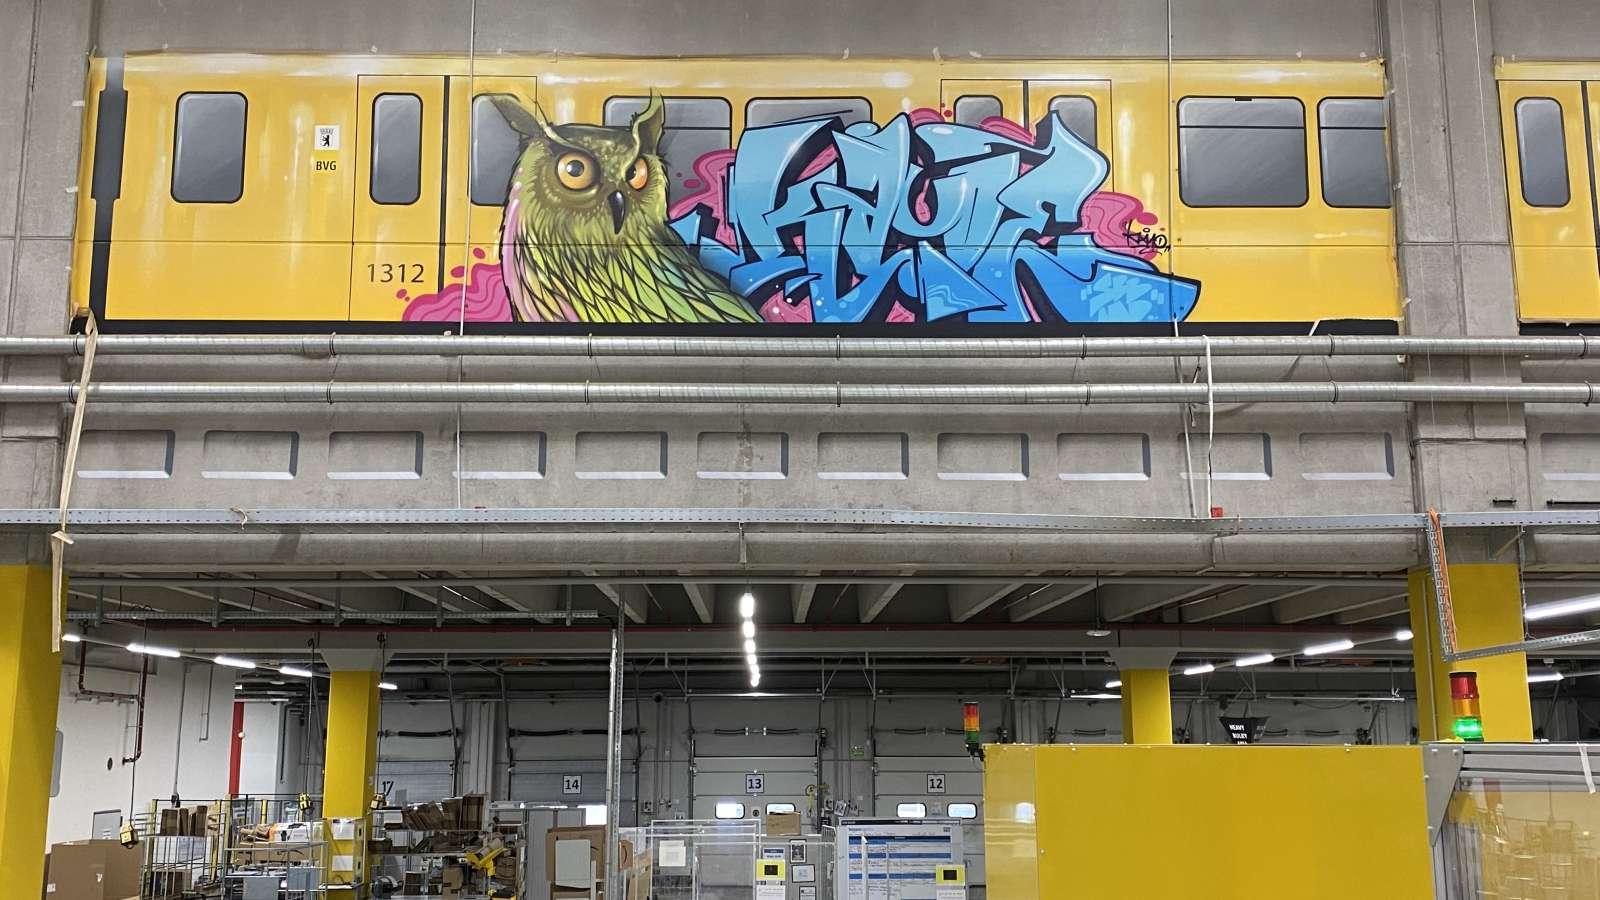 Amazon_berlin_2021_graffiti_tier_ubahn_innen_gelb_blau_graffiti_tags_logistik_20_artmos4_graffitiauftrag_graffitikuenstler